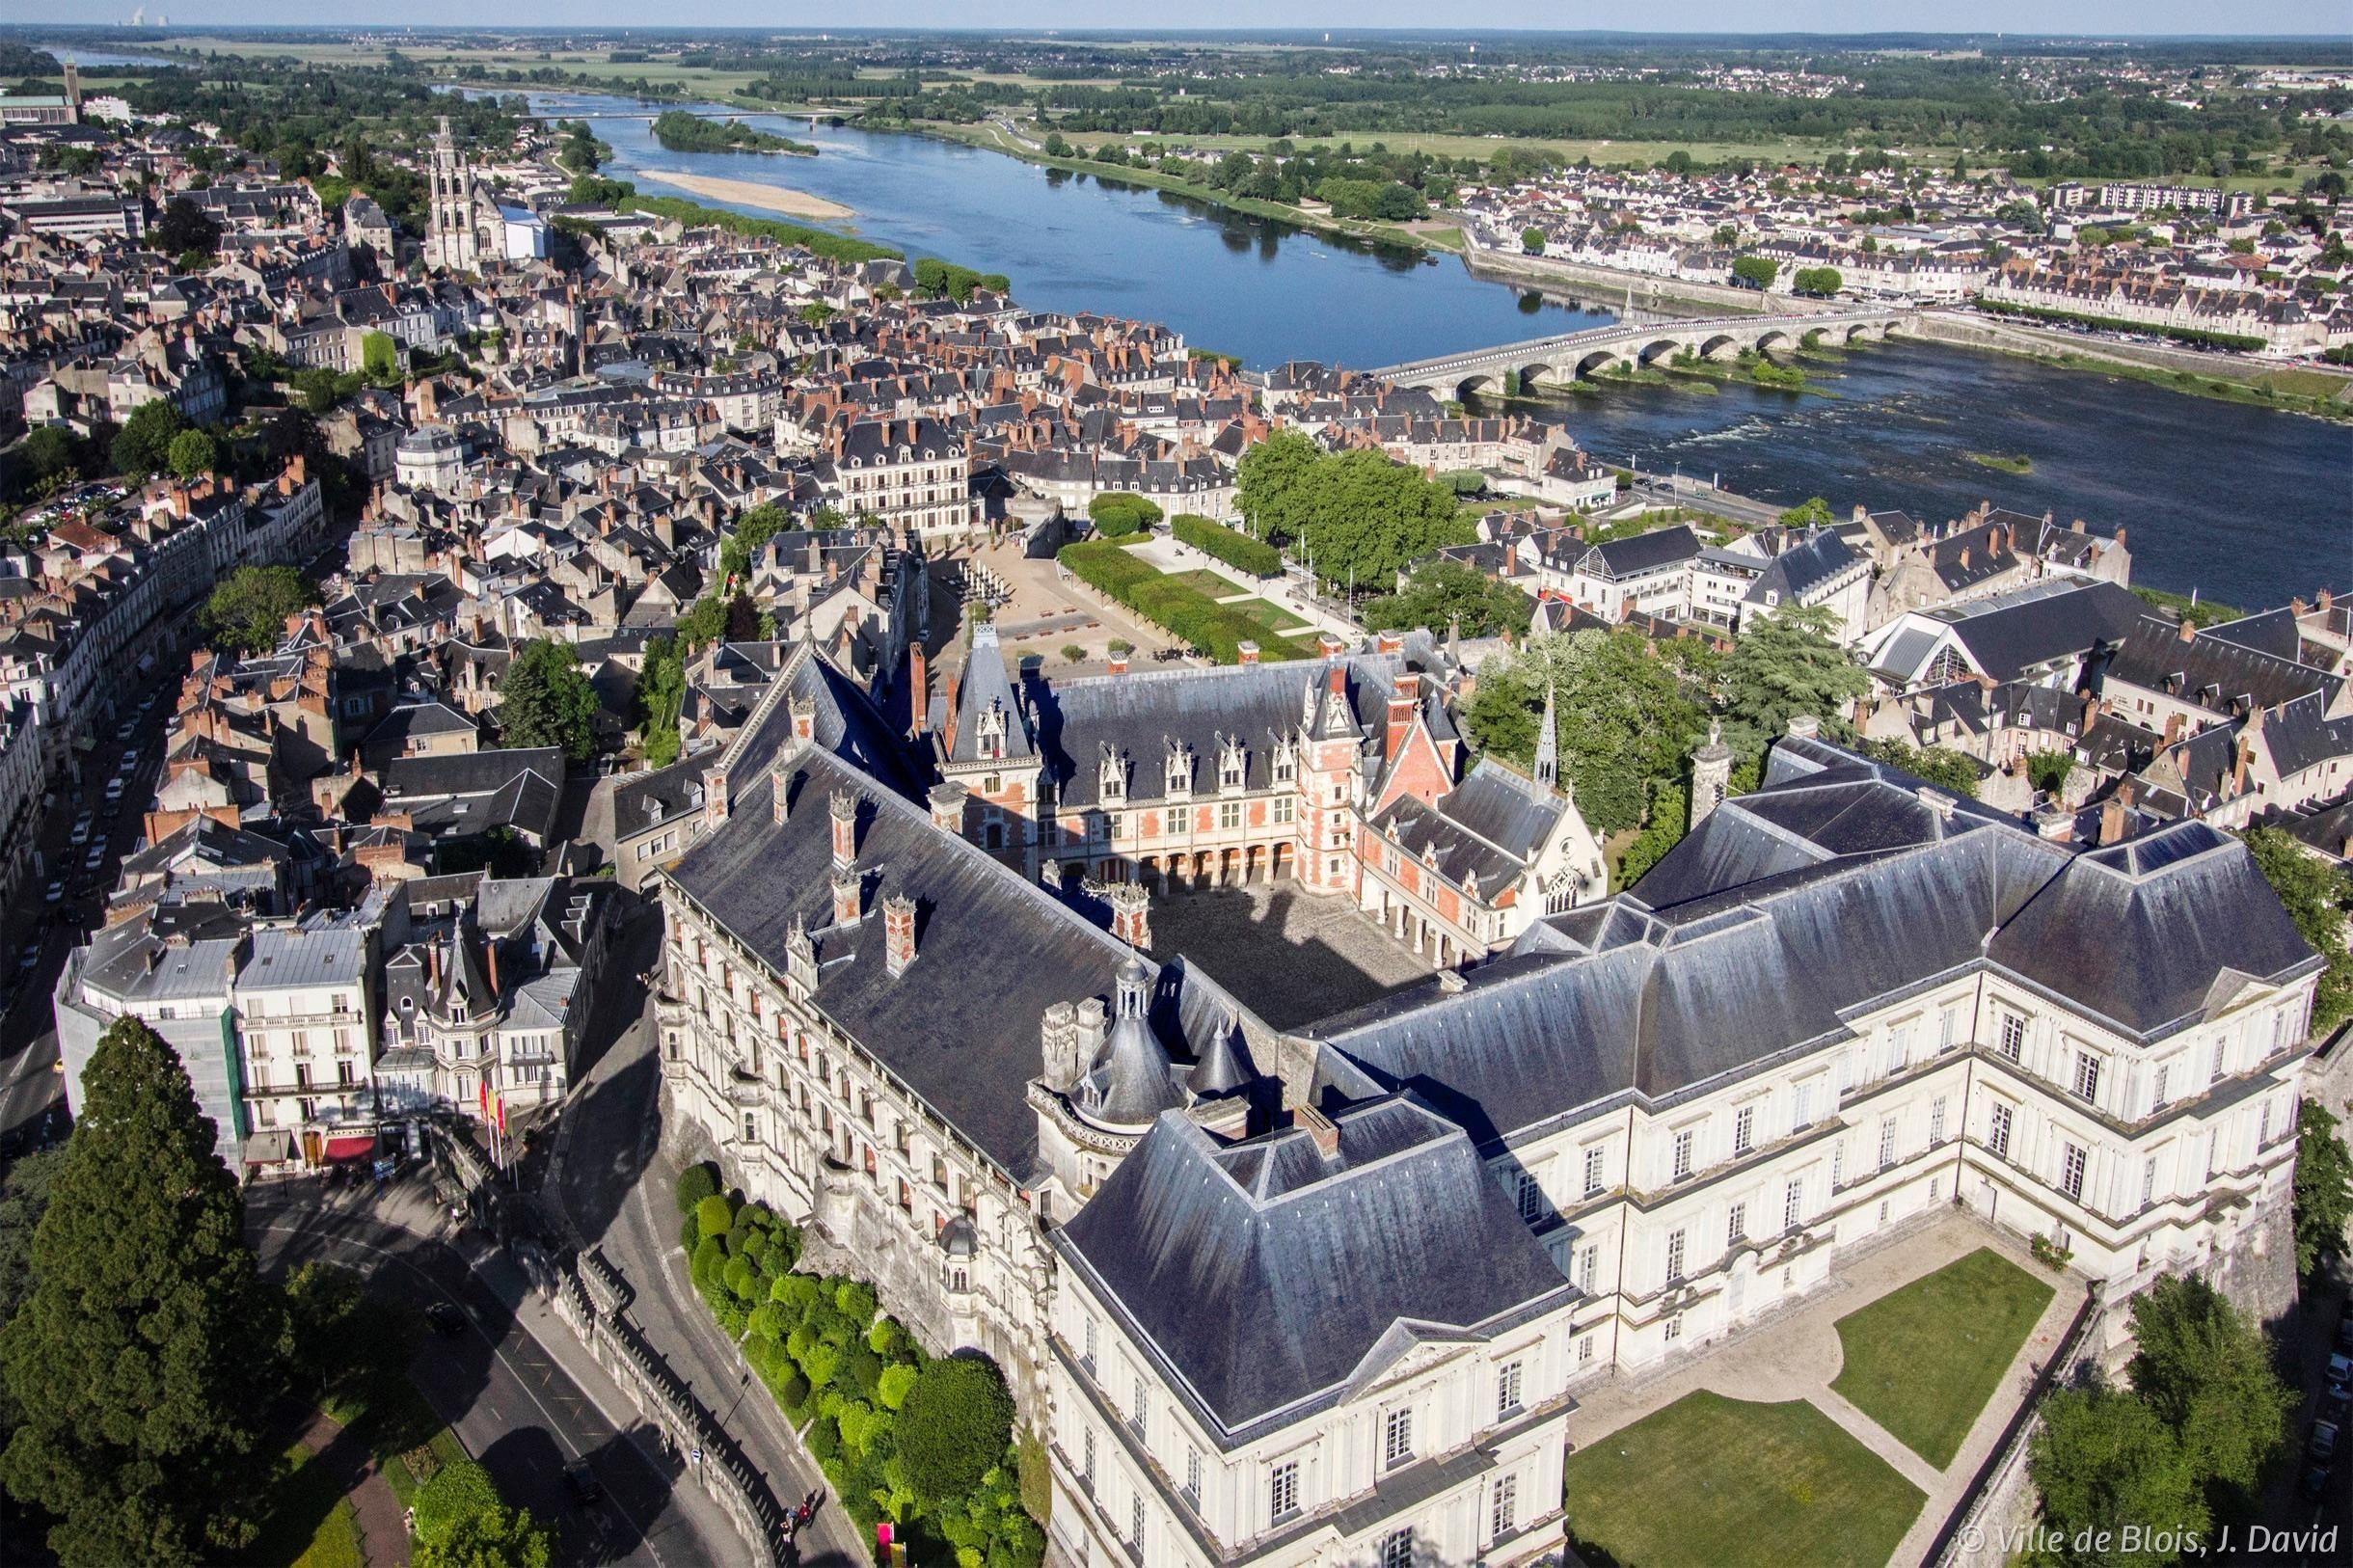 Blois chateauroyal 201506 jpthibault jdavid 0